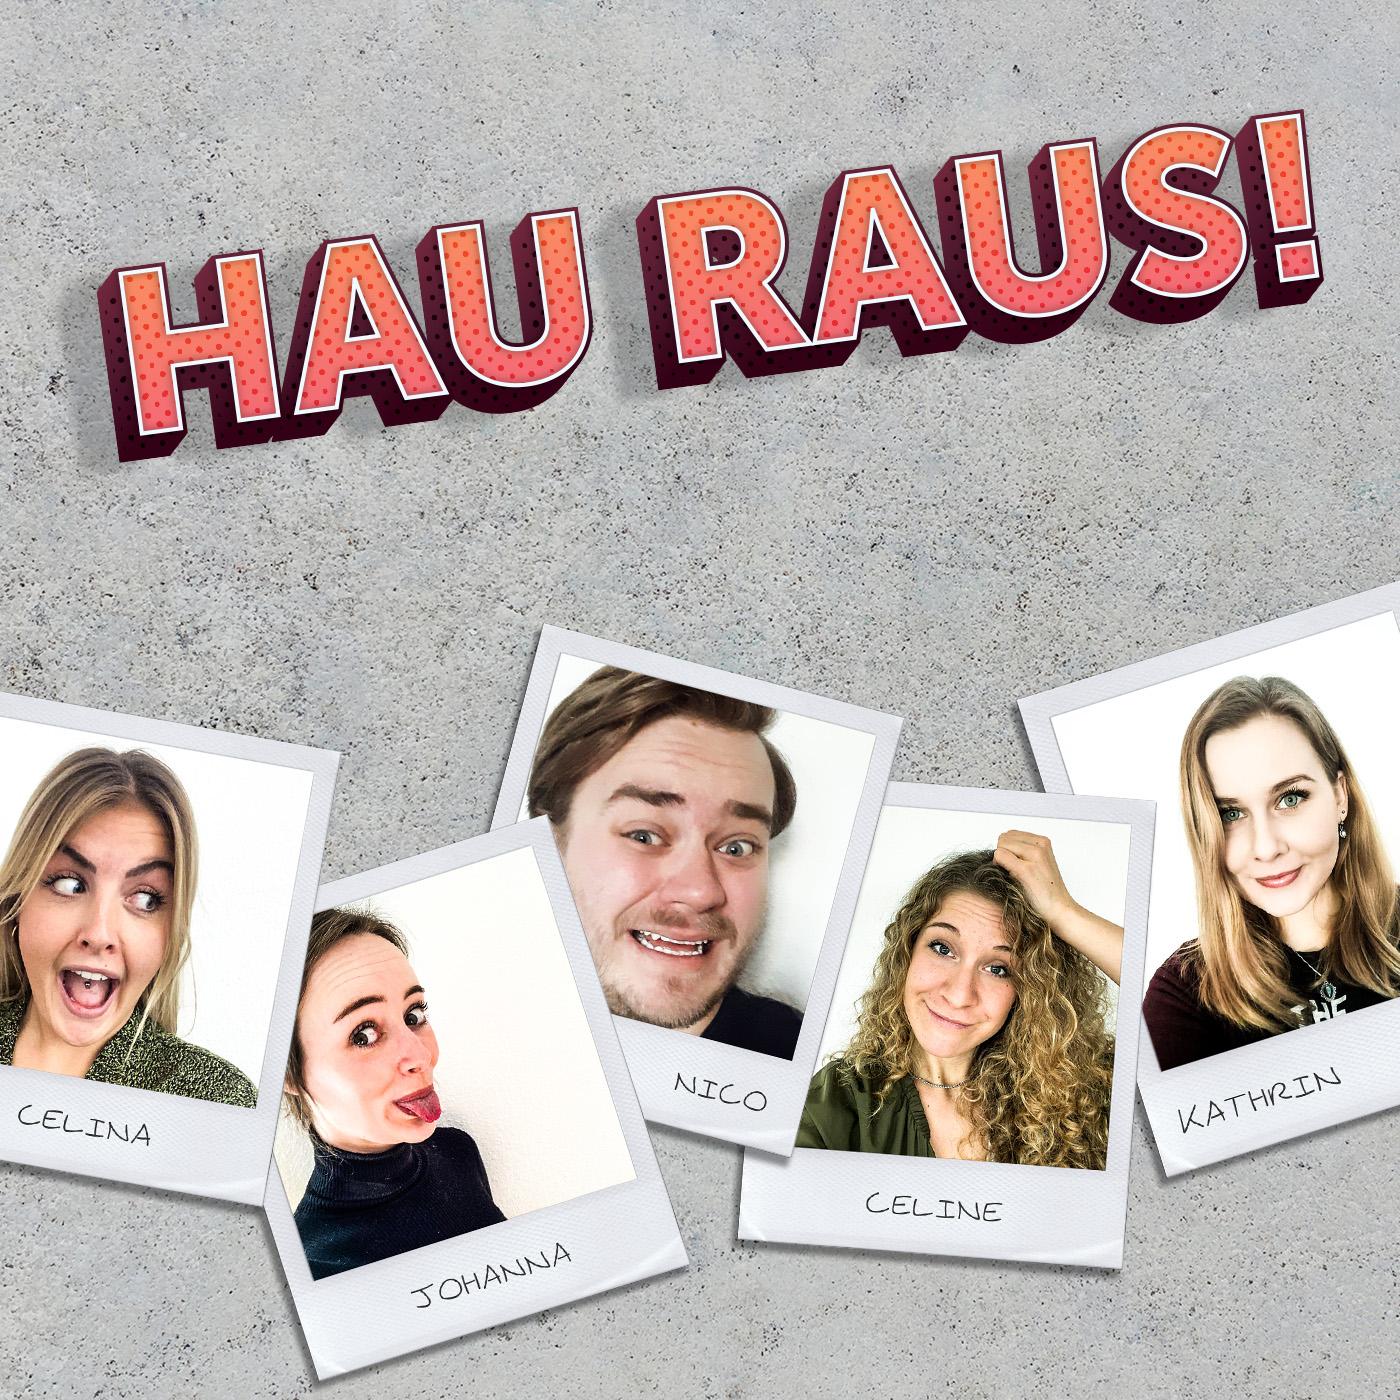 Logo vom Podcast Hau Raus!